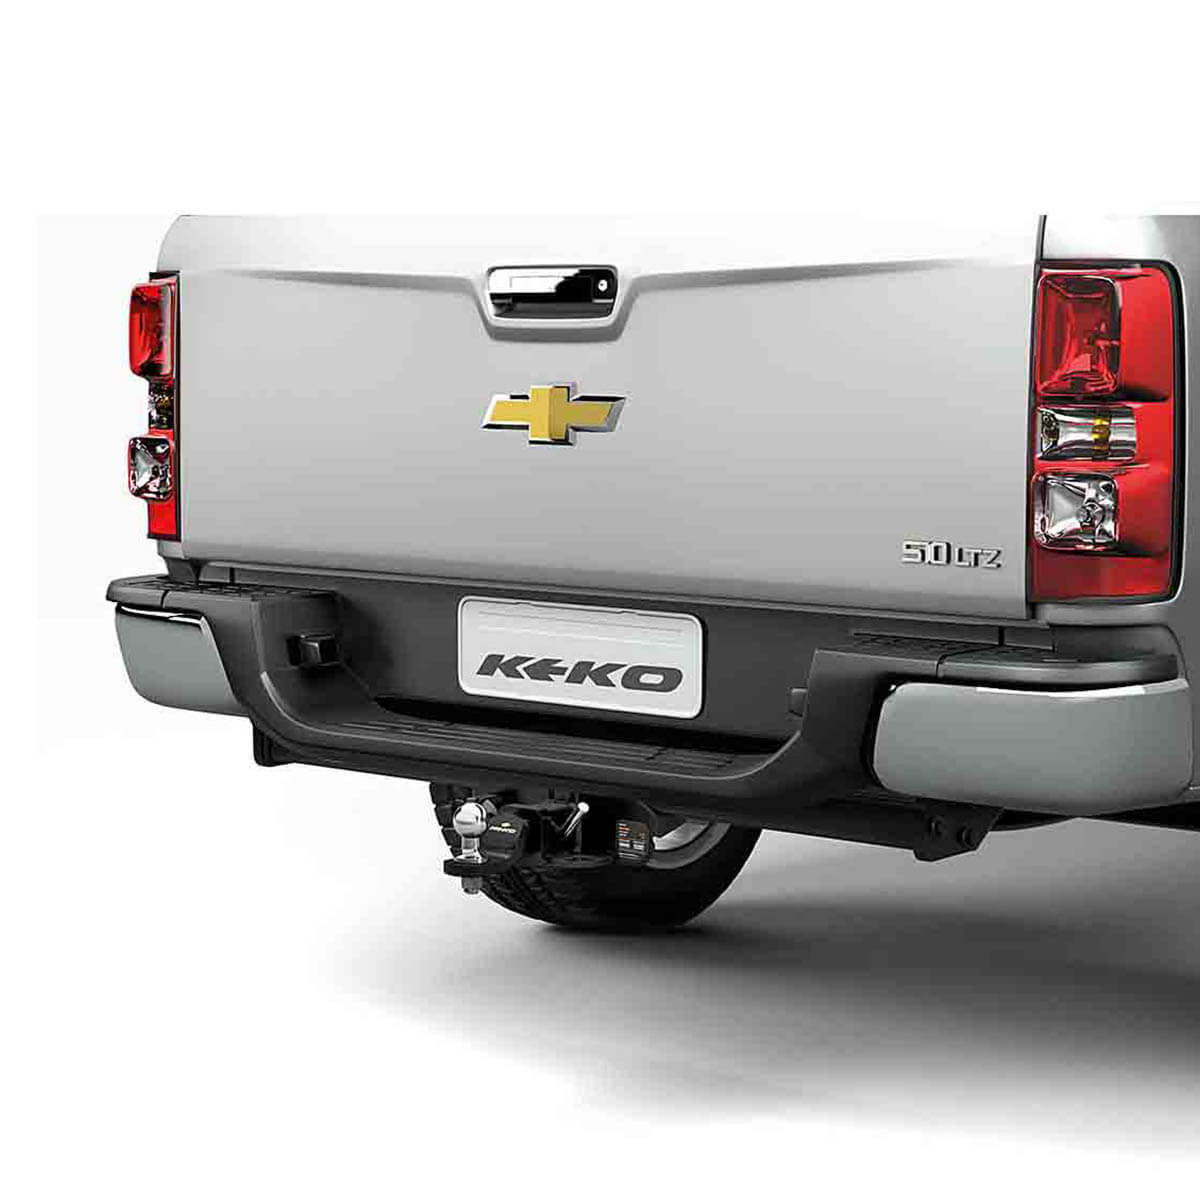 Engate de reboque removível Keko K1 Nova S10 2012 a 2021